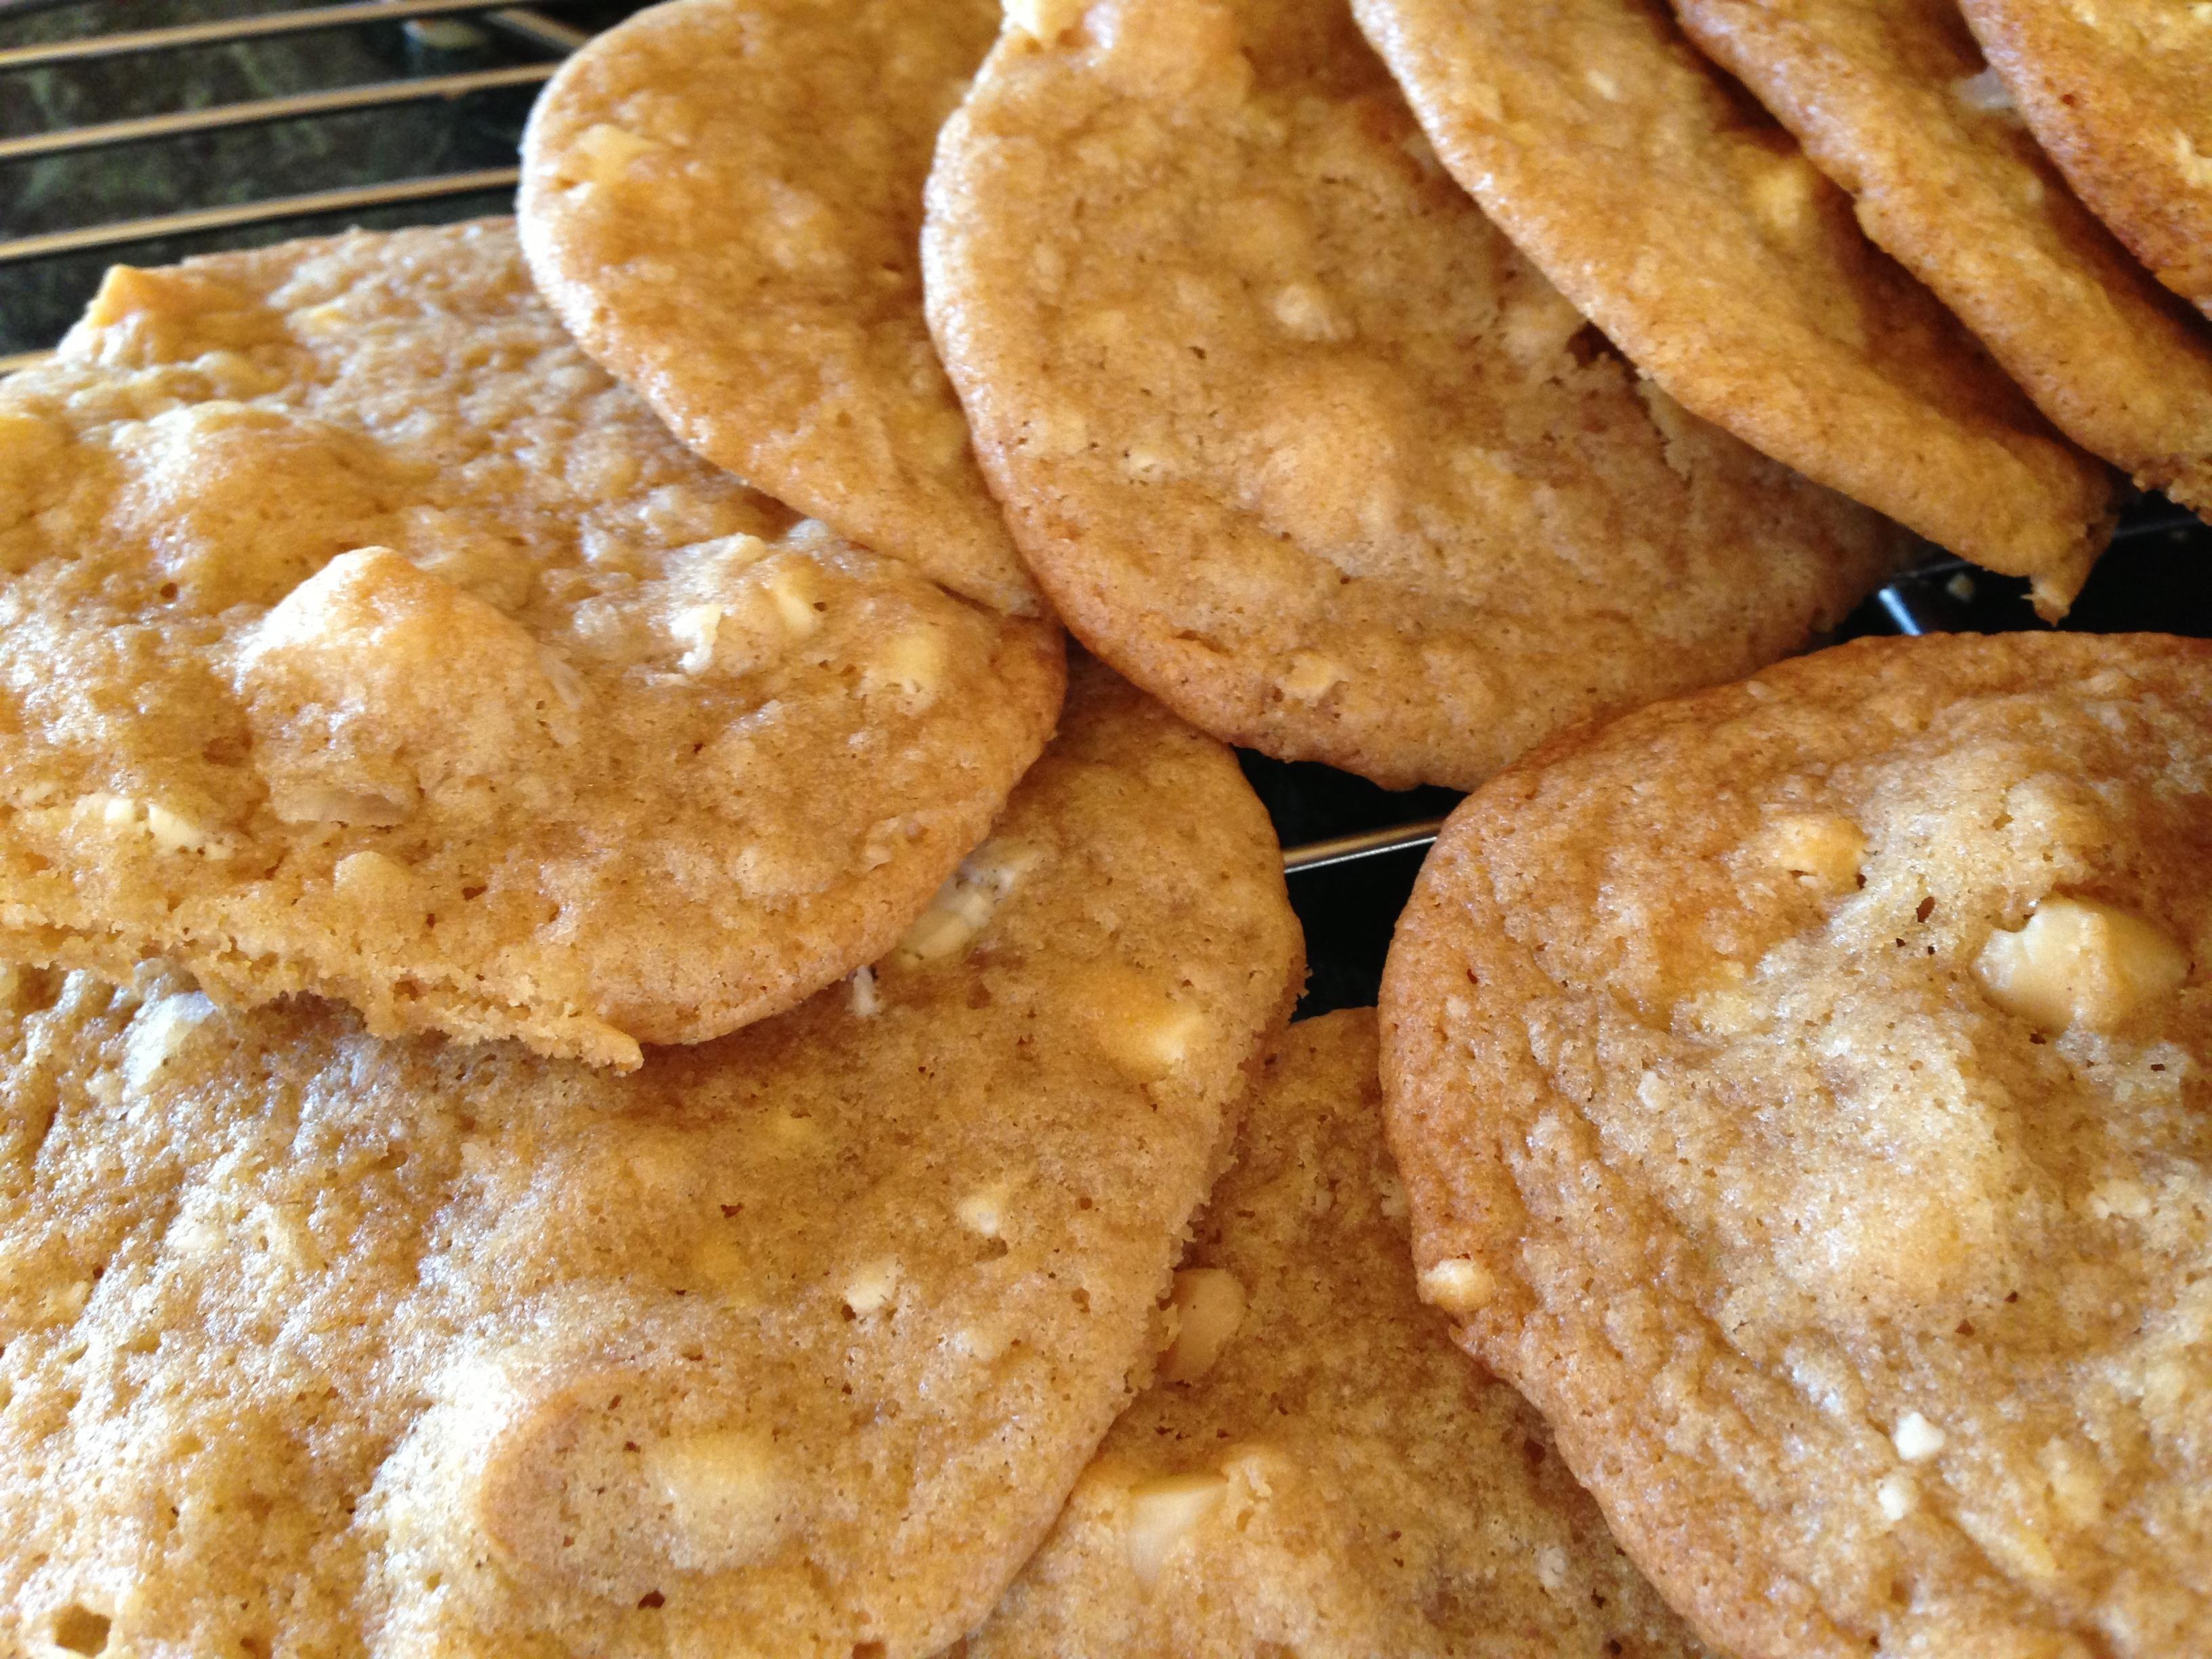 White Chocolate Macadamia Nut Cookie | Yummy Dessert Recipes ...